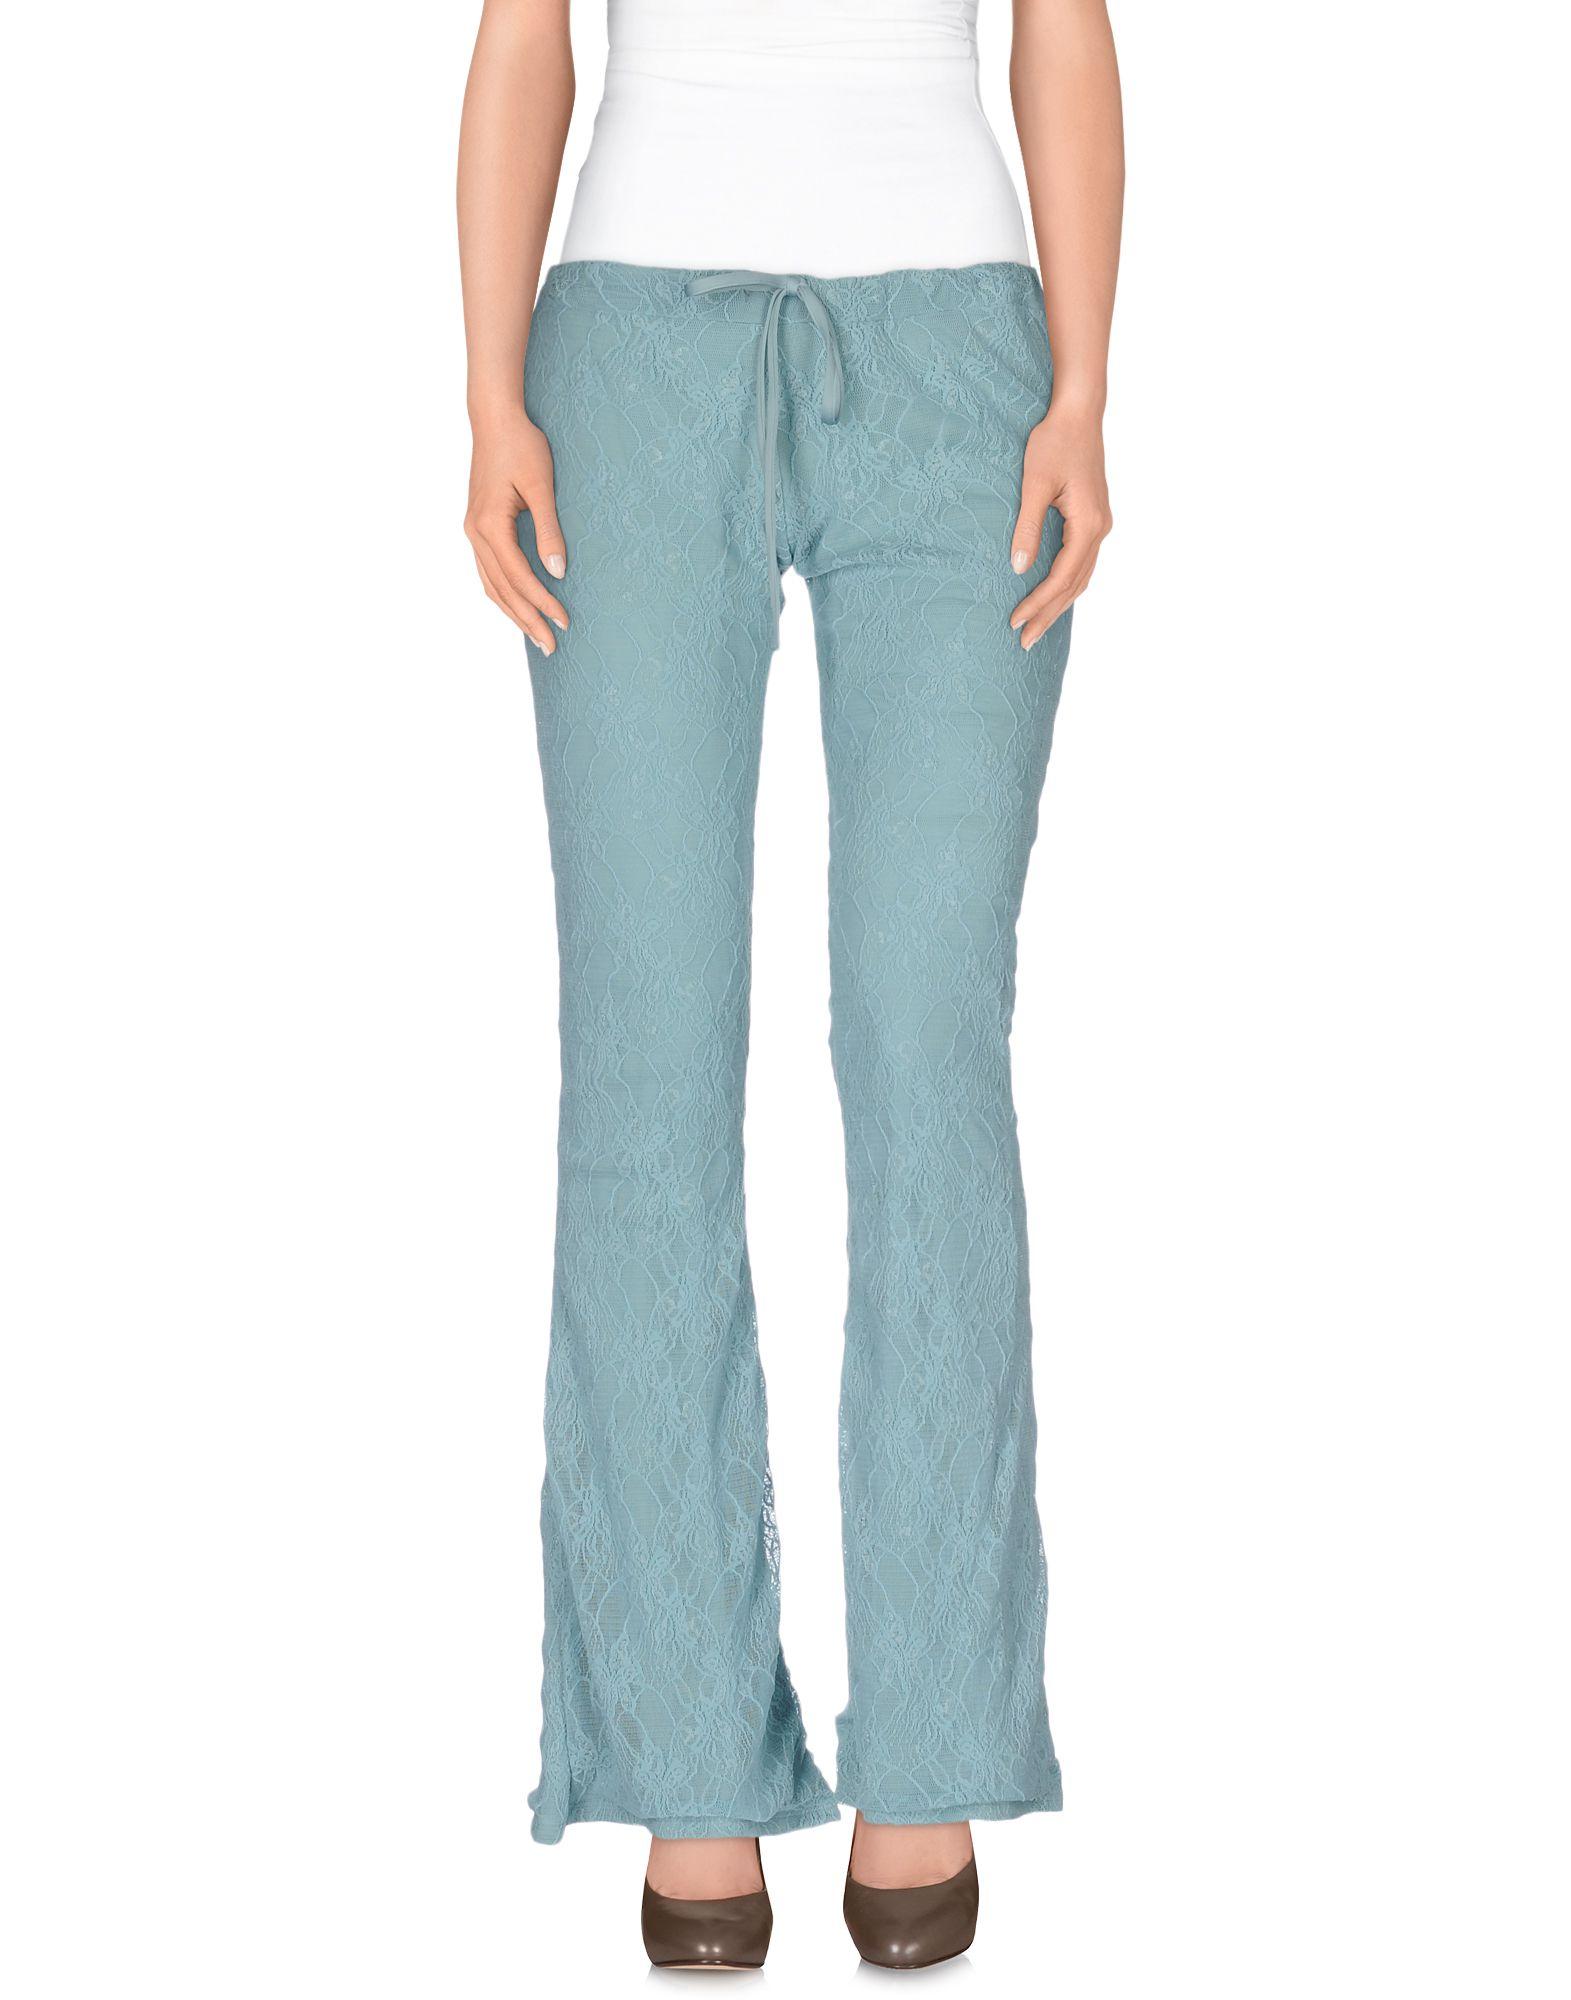 B-KINI MILANO MARITTIMA Повседневные брюки цены онлайн